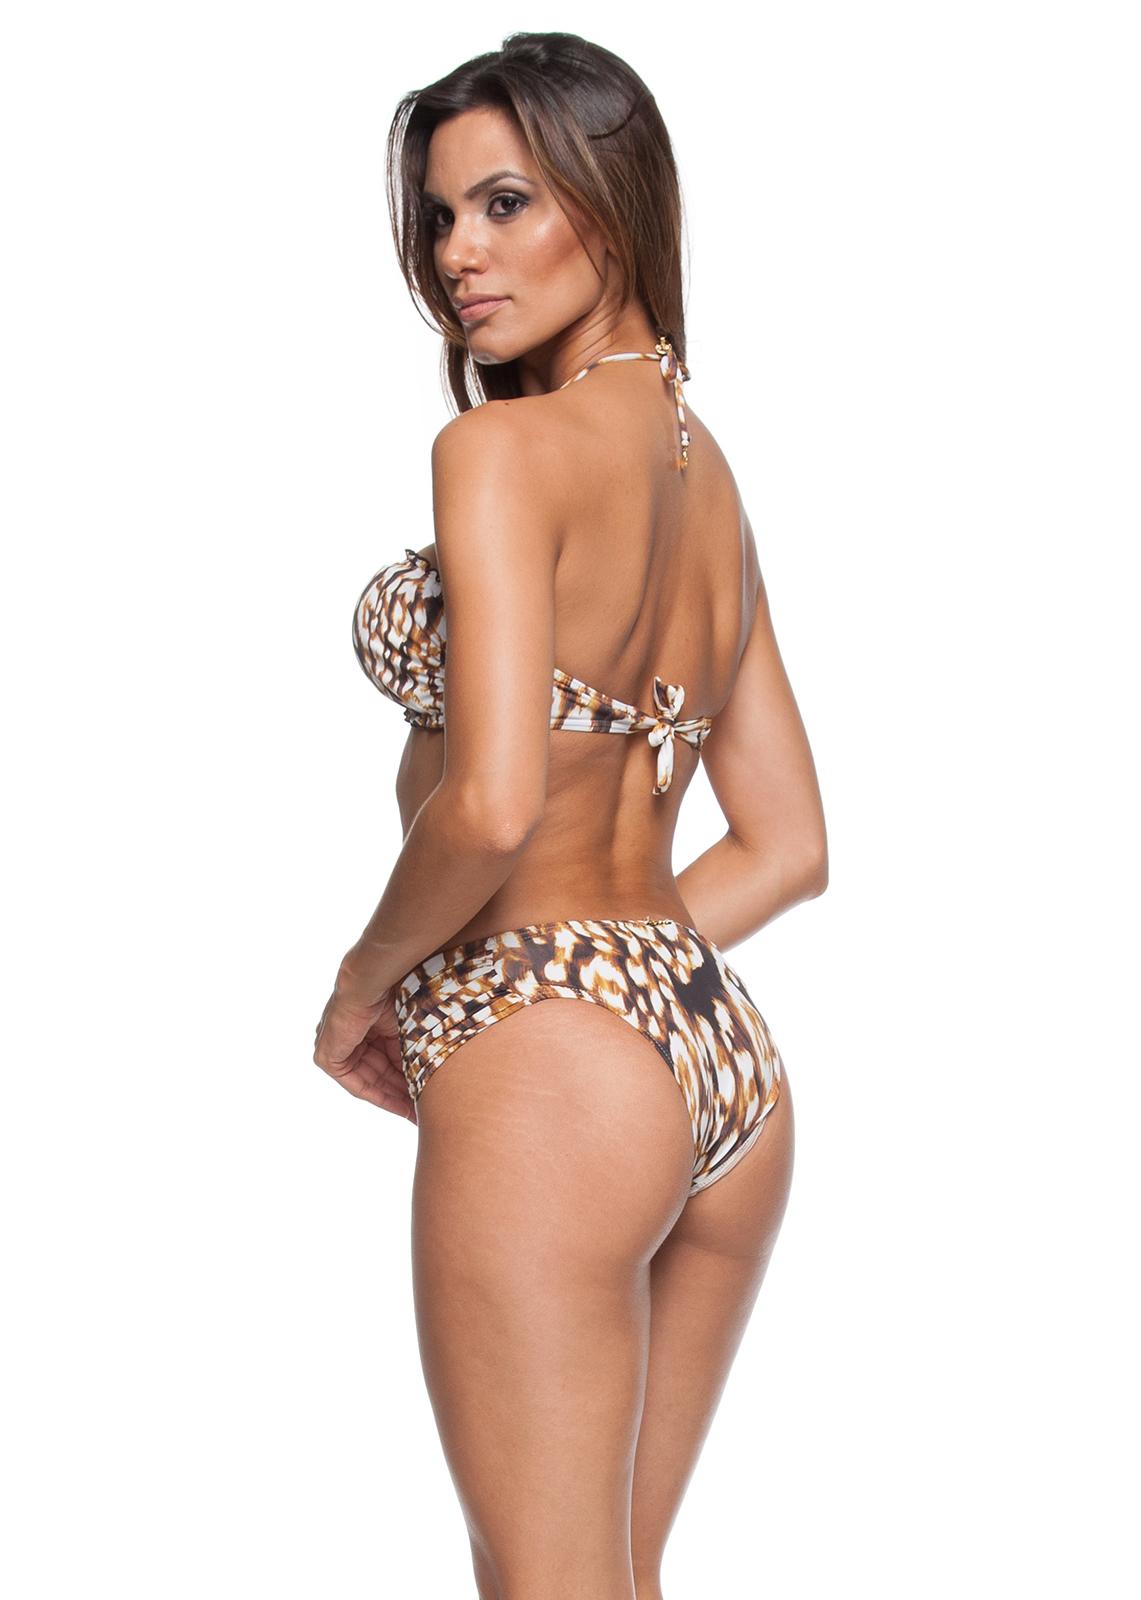 72d059b0d076 ... Leopard print bikini with bandeau top and accessories - DIVA LEOPARD